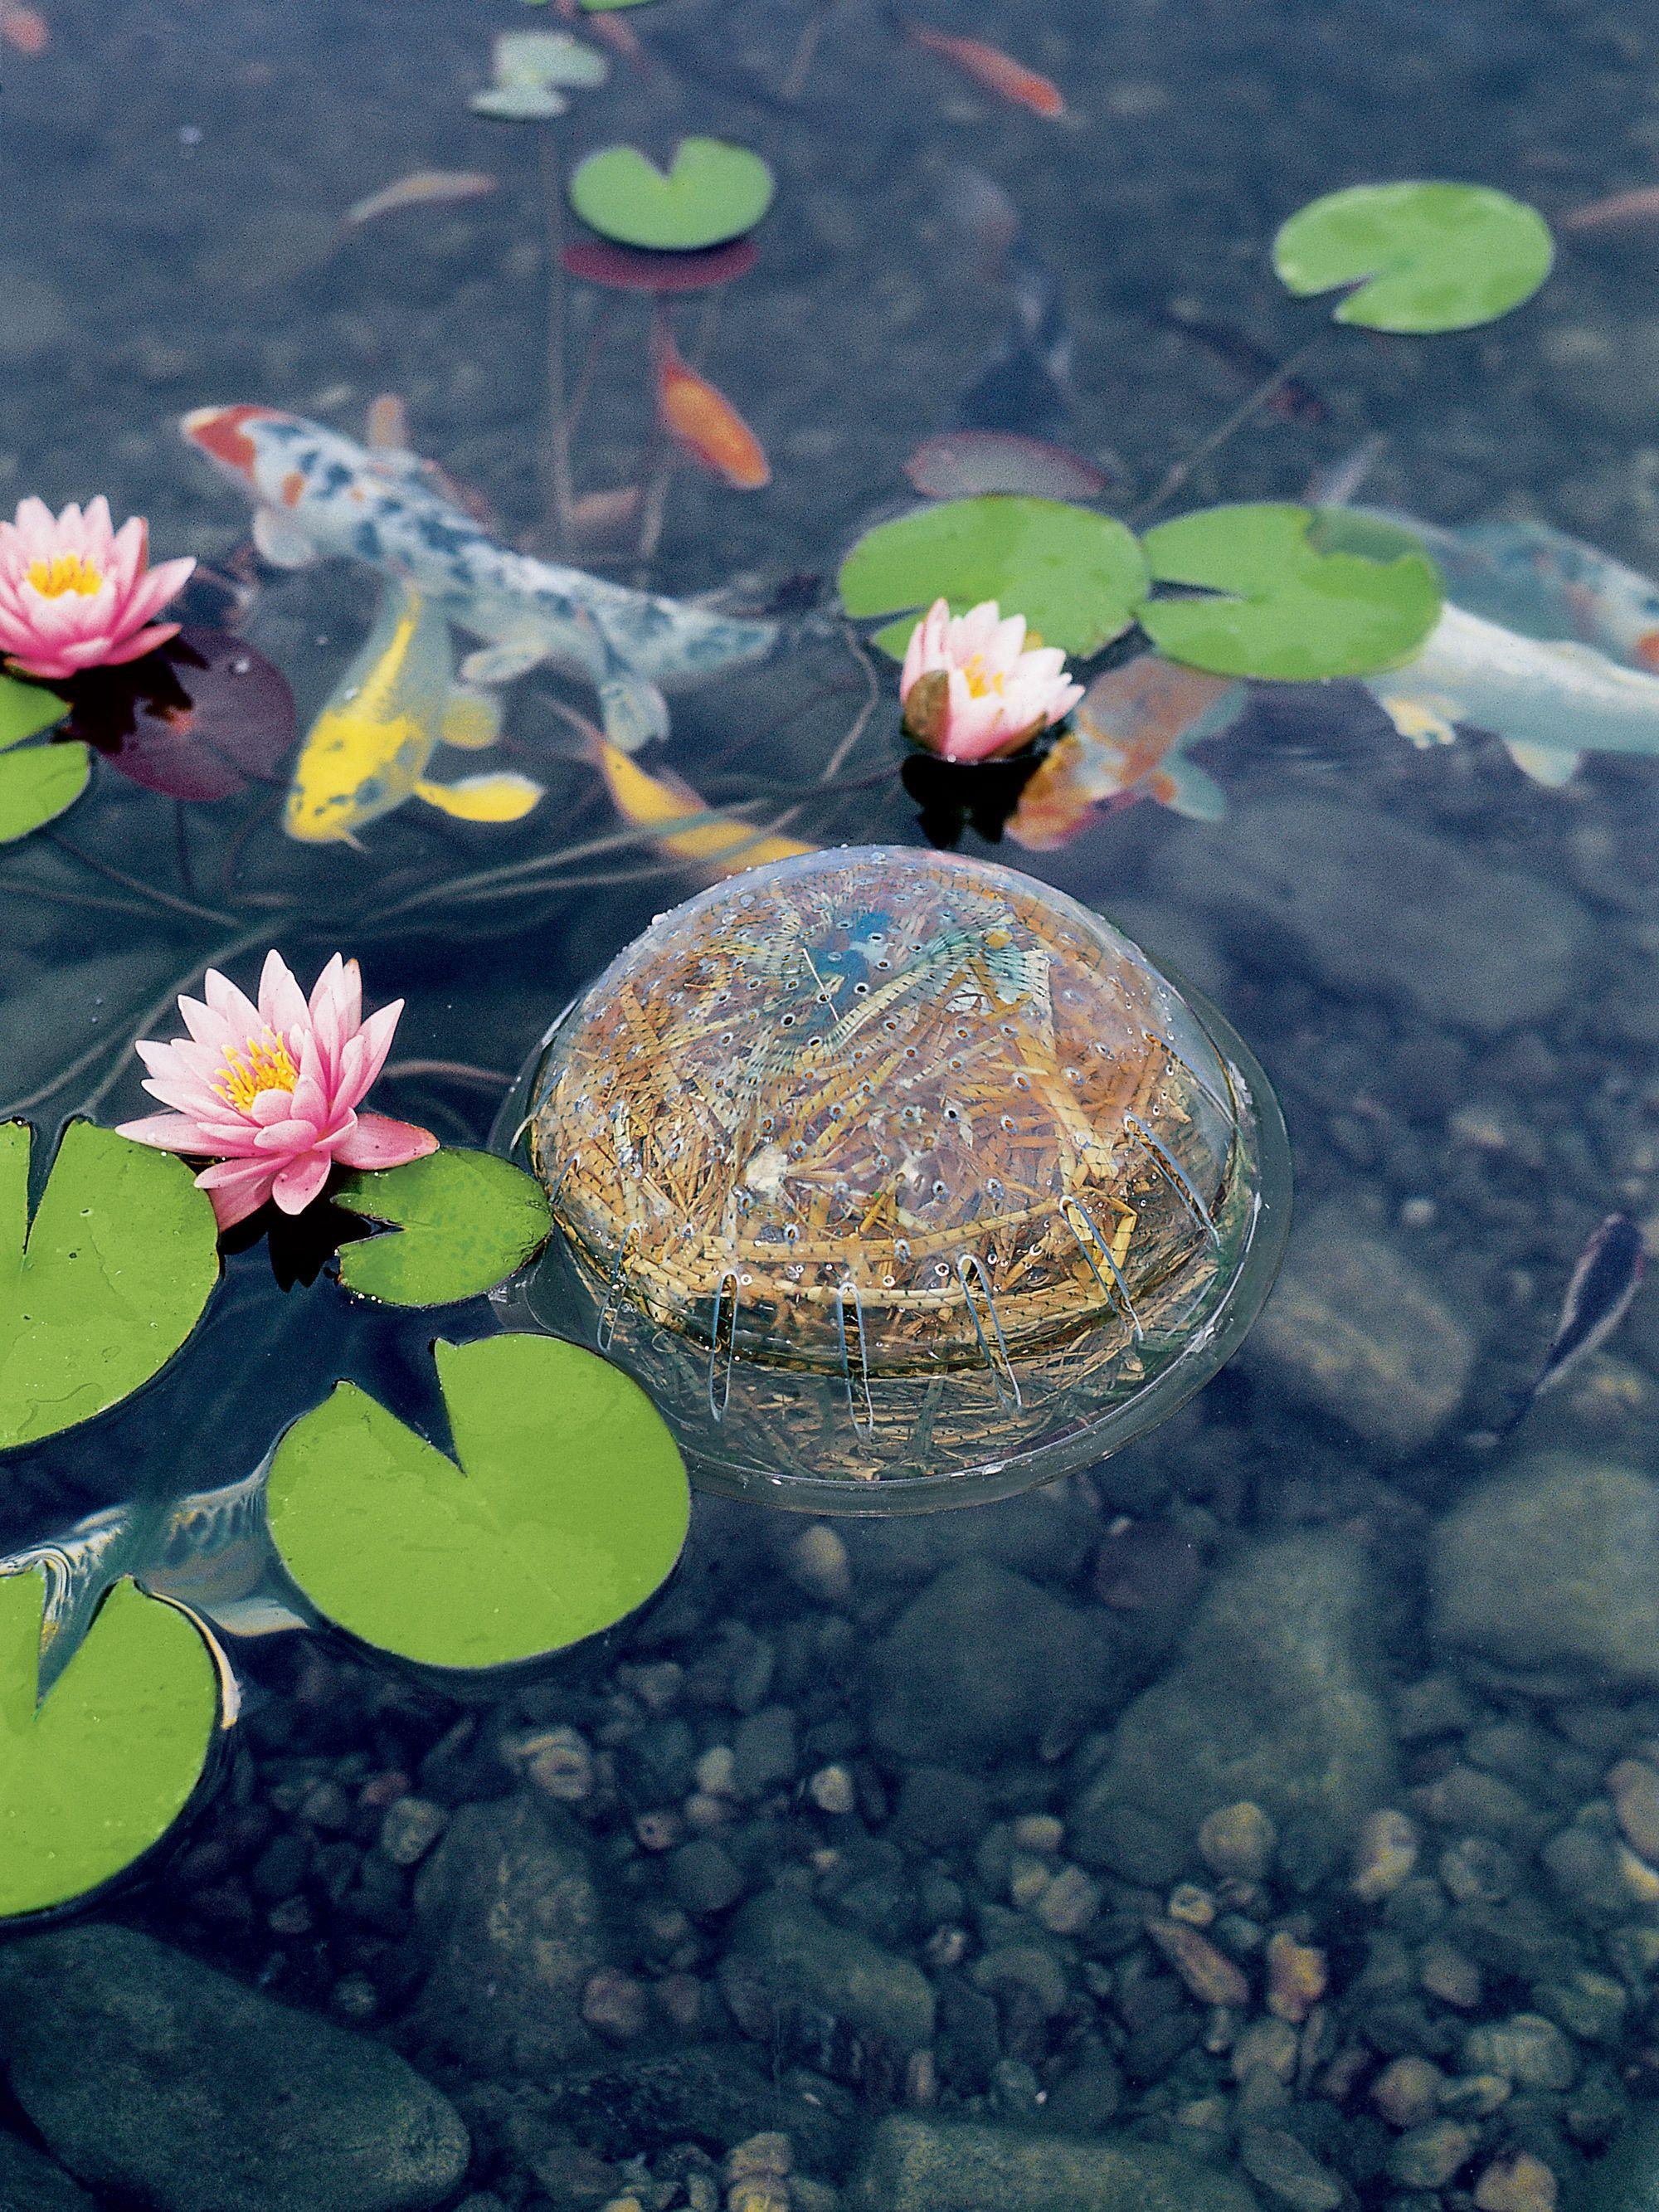 Barley Straw Bales Natural Pond Cleaner Gardeners Com Natural Pond Indoor Water Garden Container Water Gardens